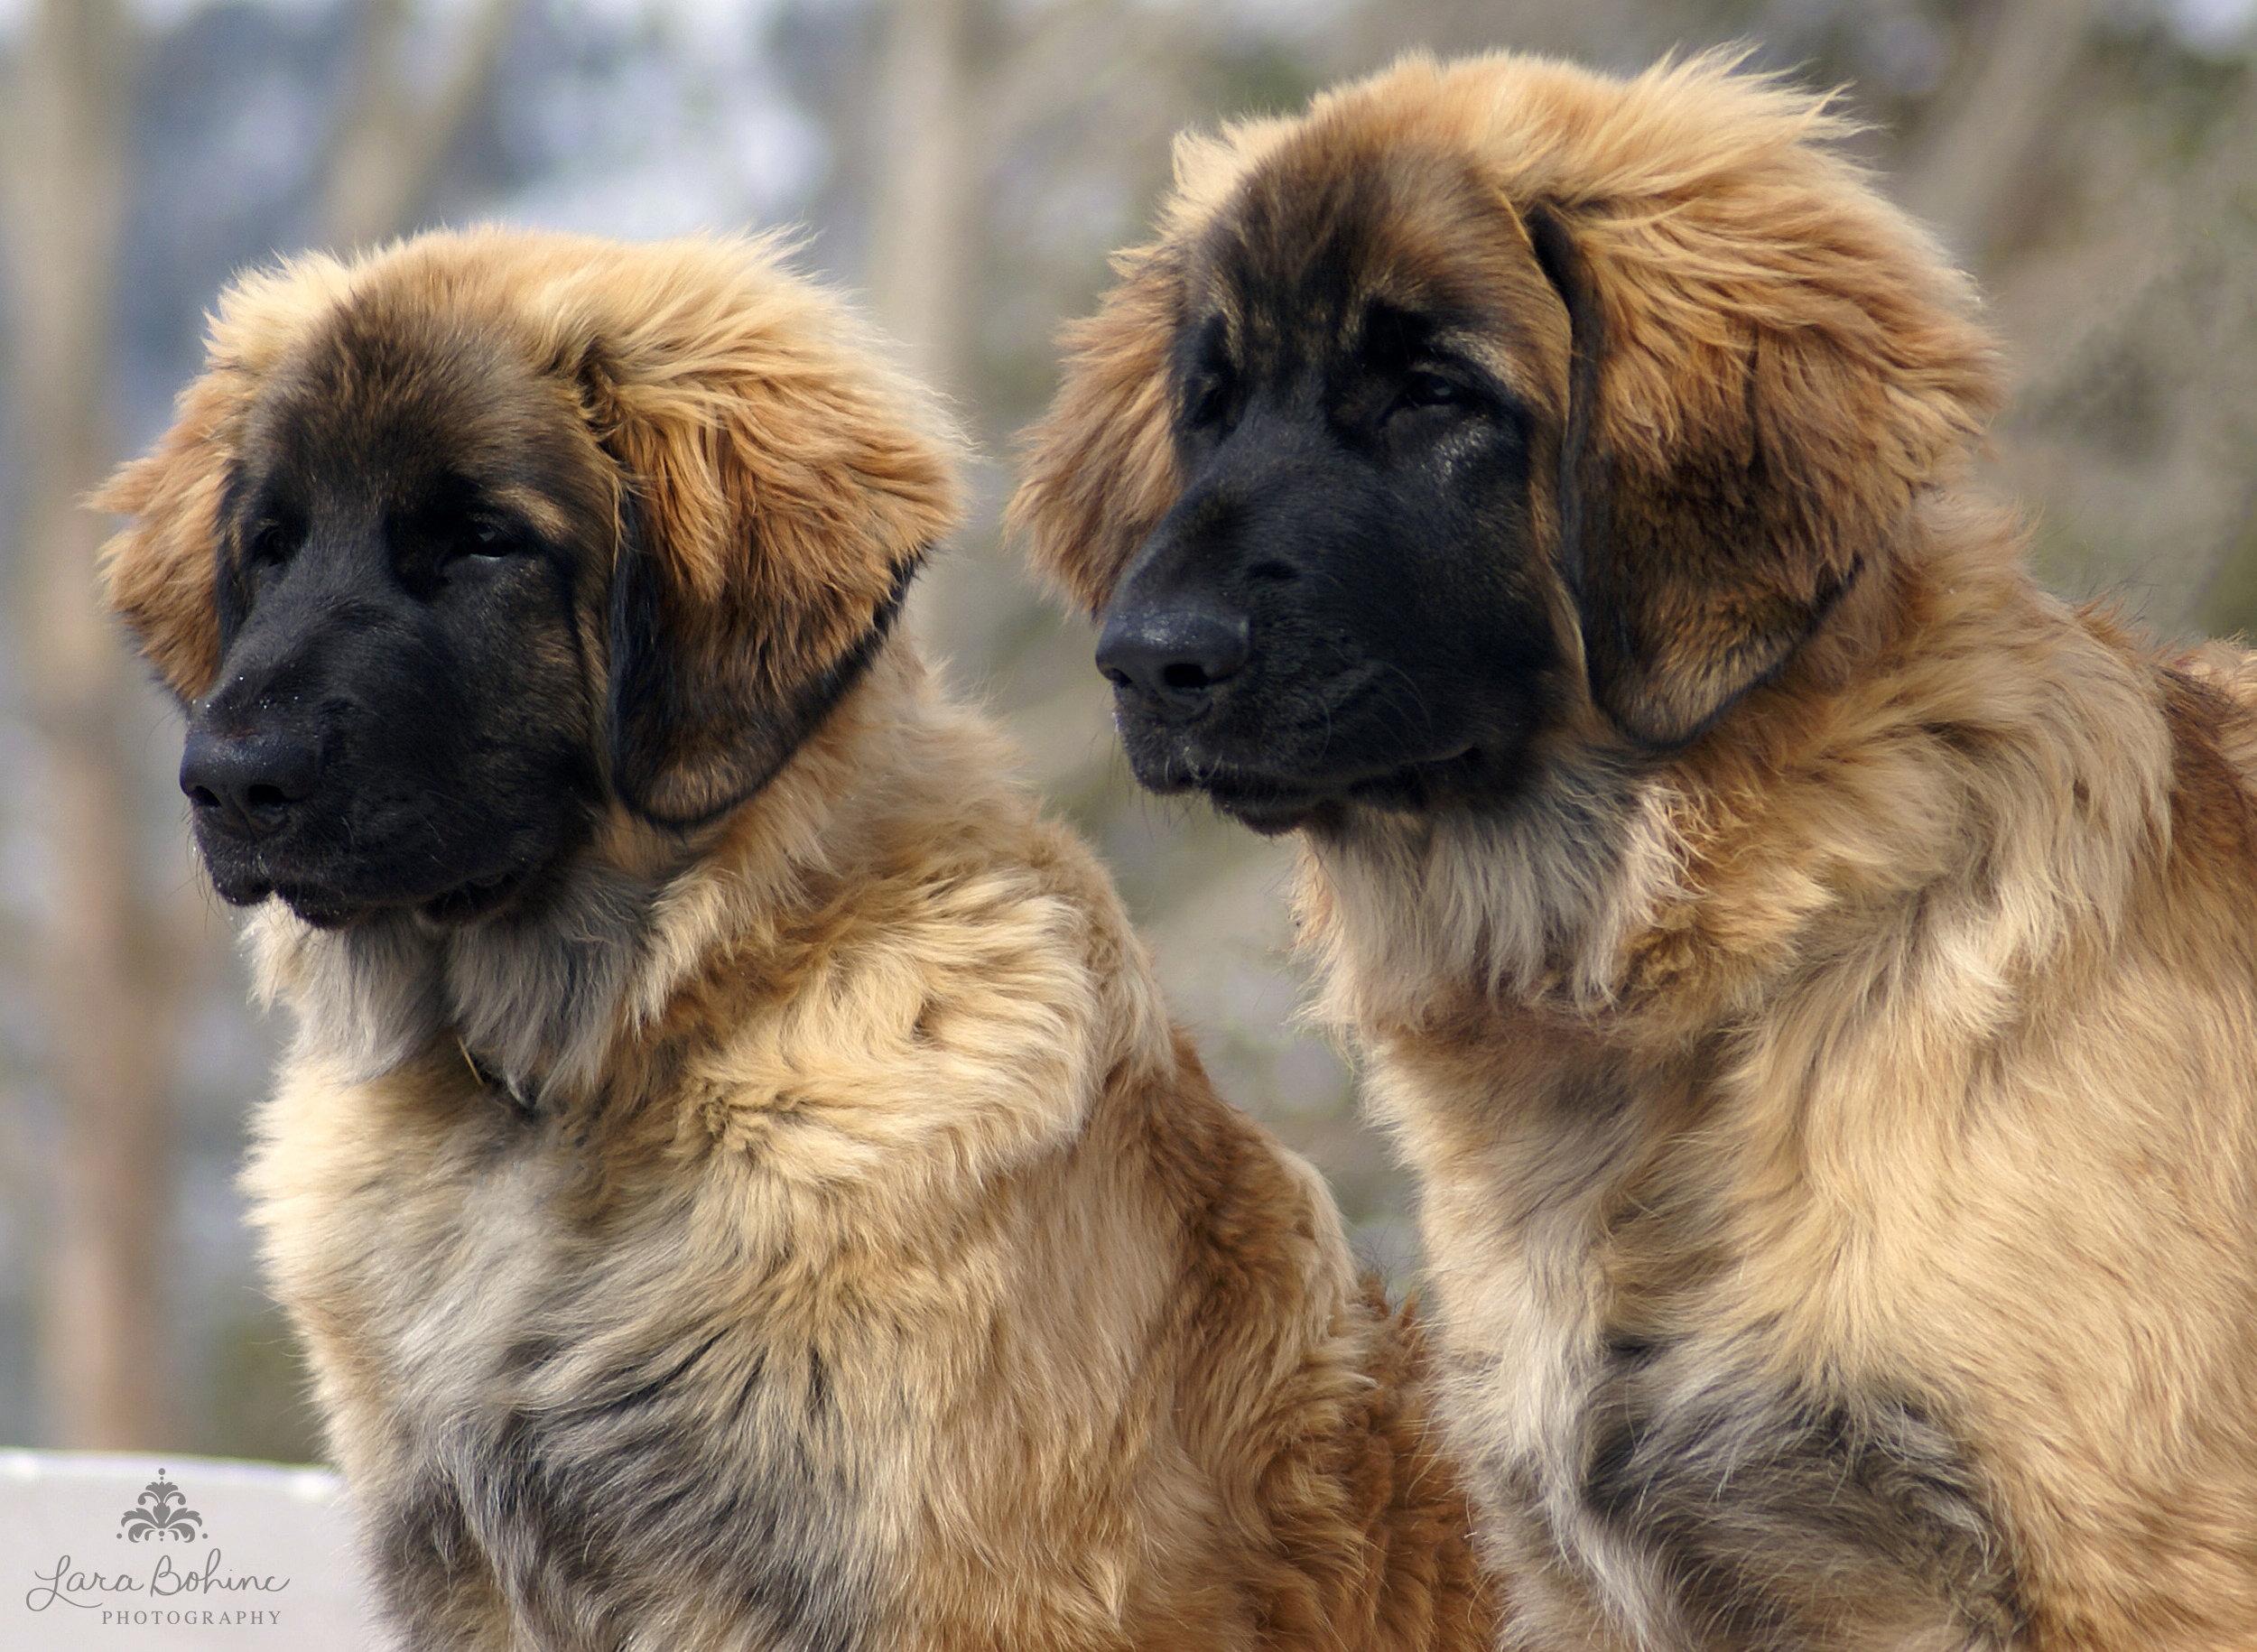 Colorado Puppies RECROPPEDjpg.jpg